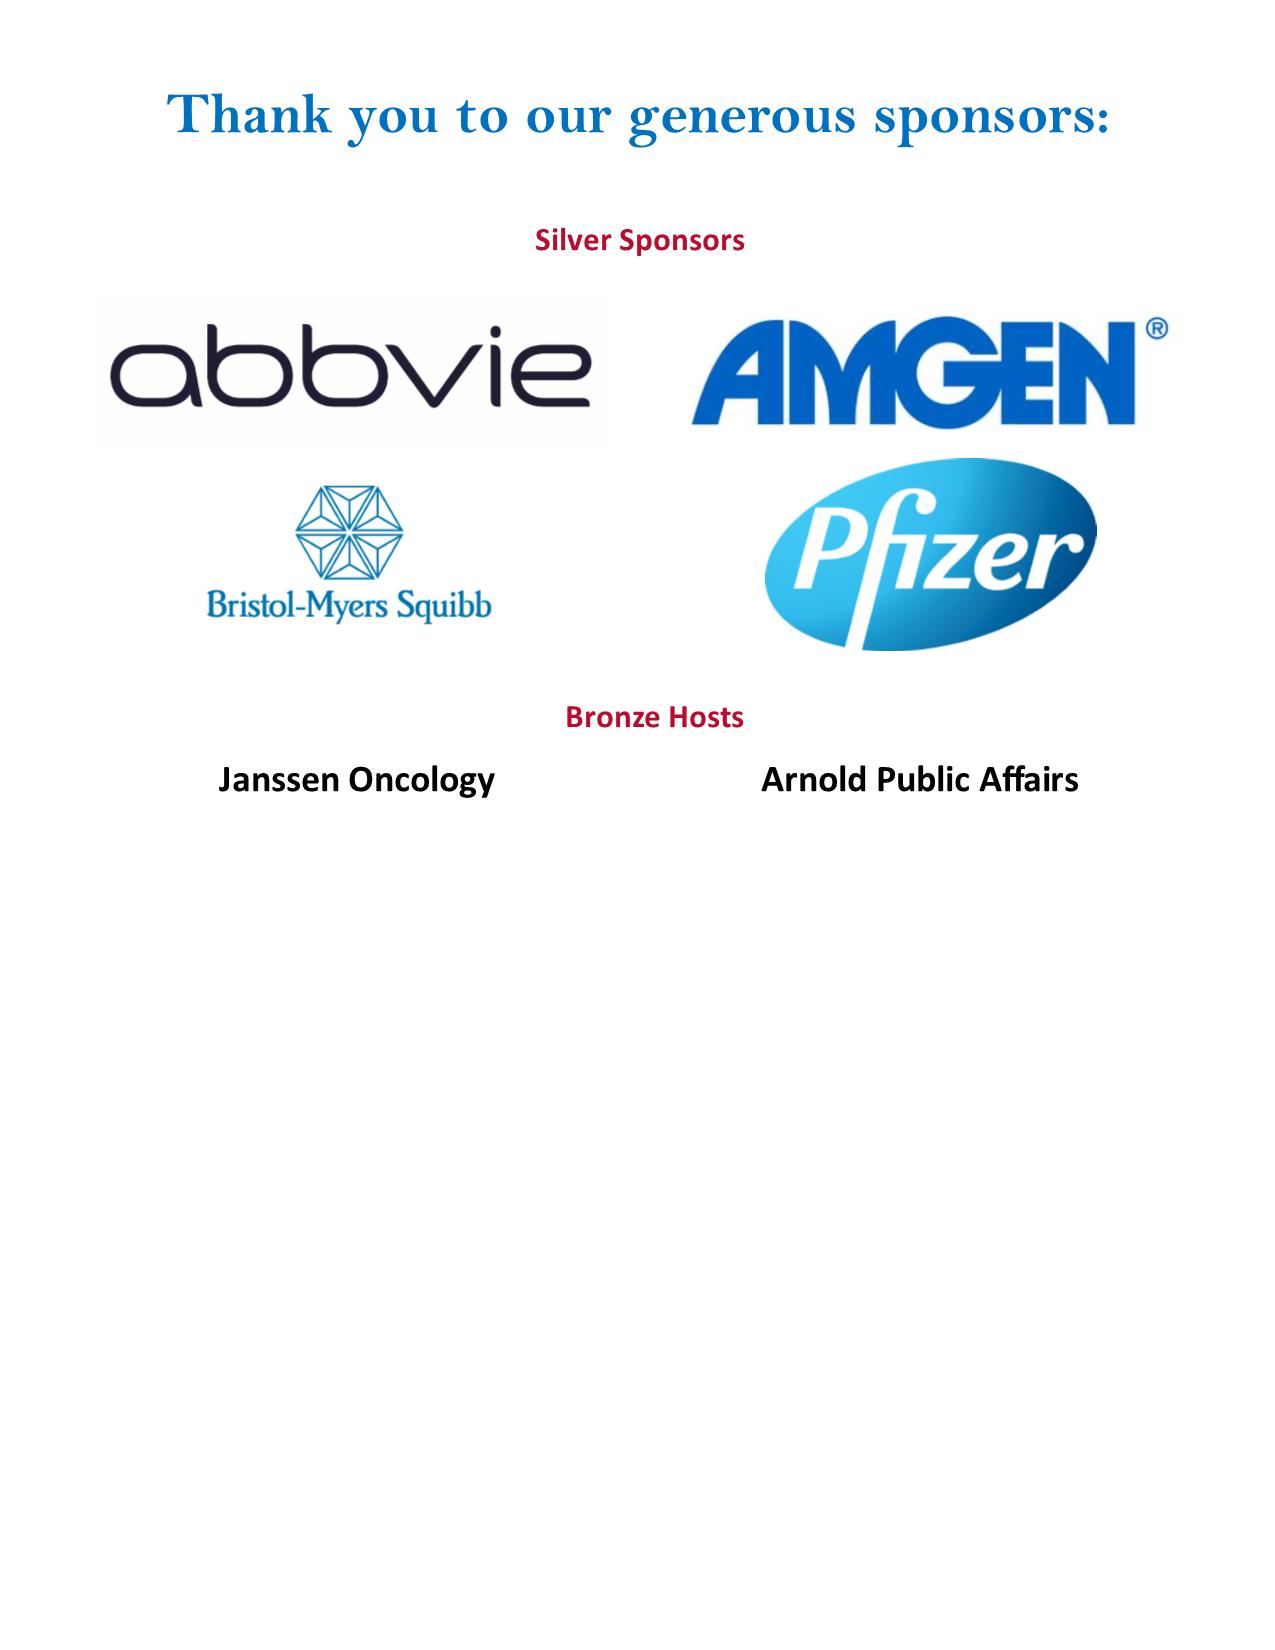 ATX sponsors